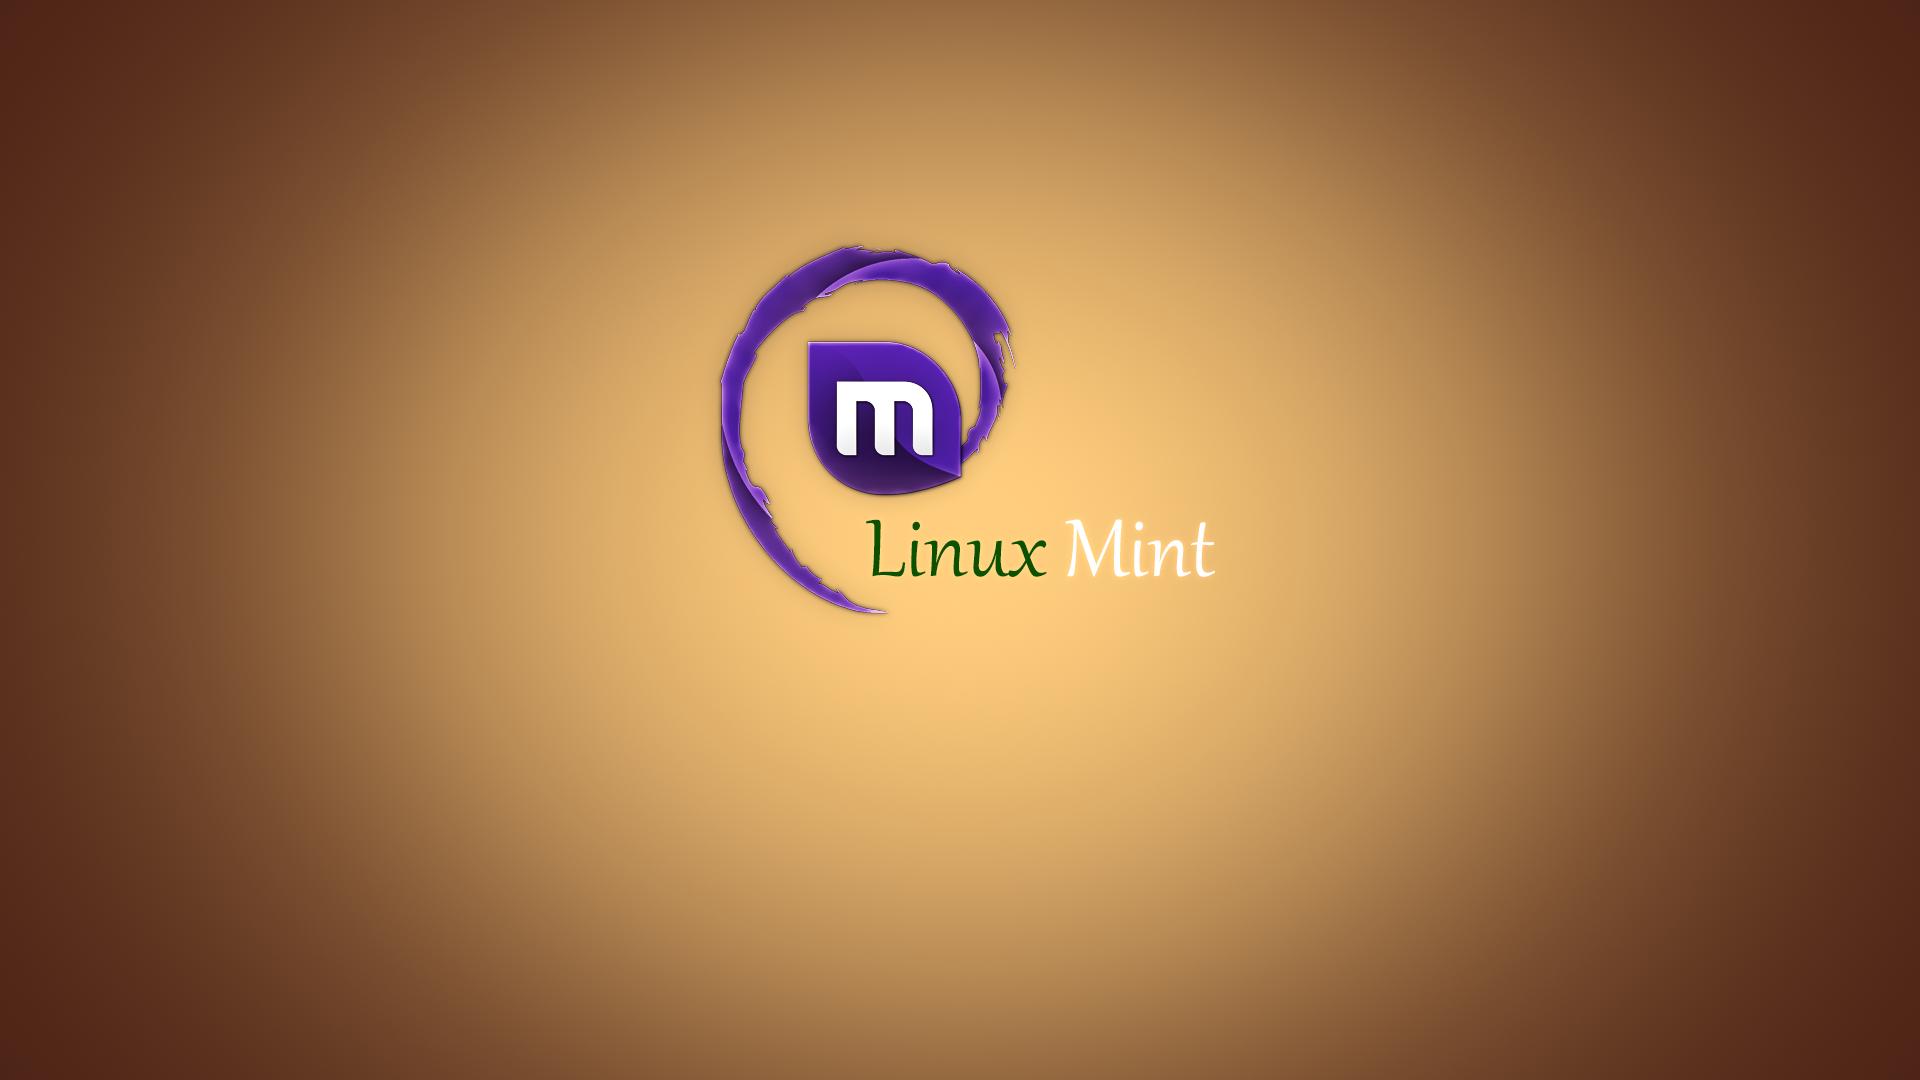 Linux Mint Wallpaper By Karara160